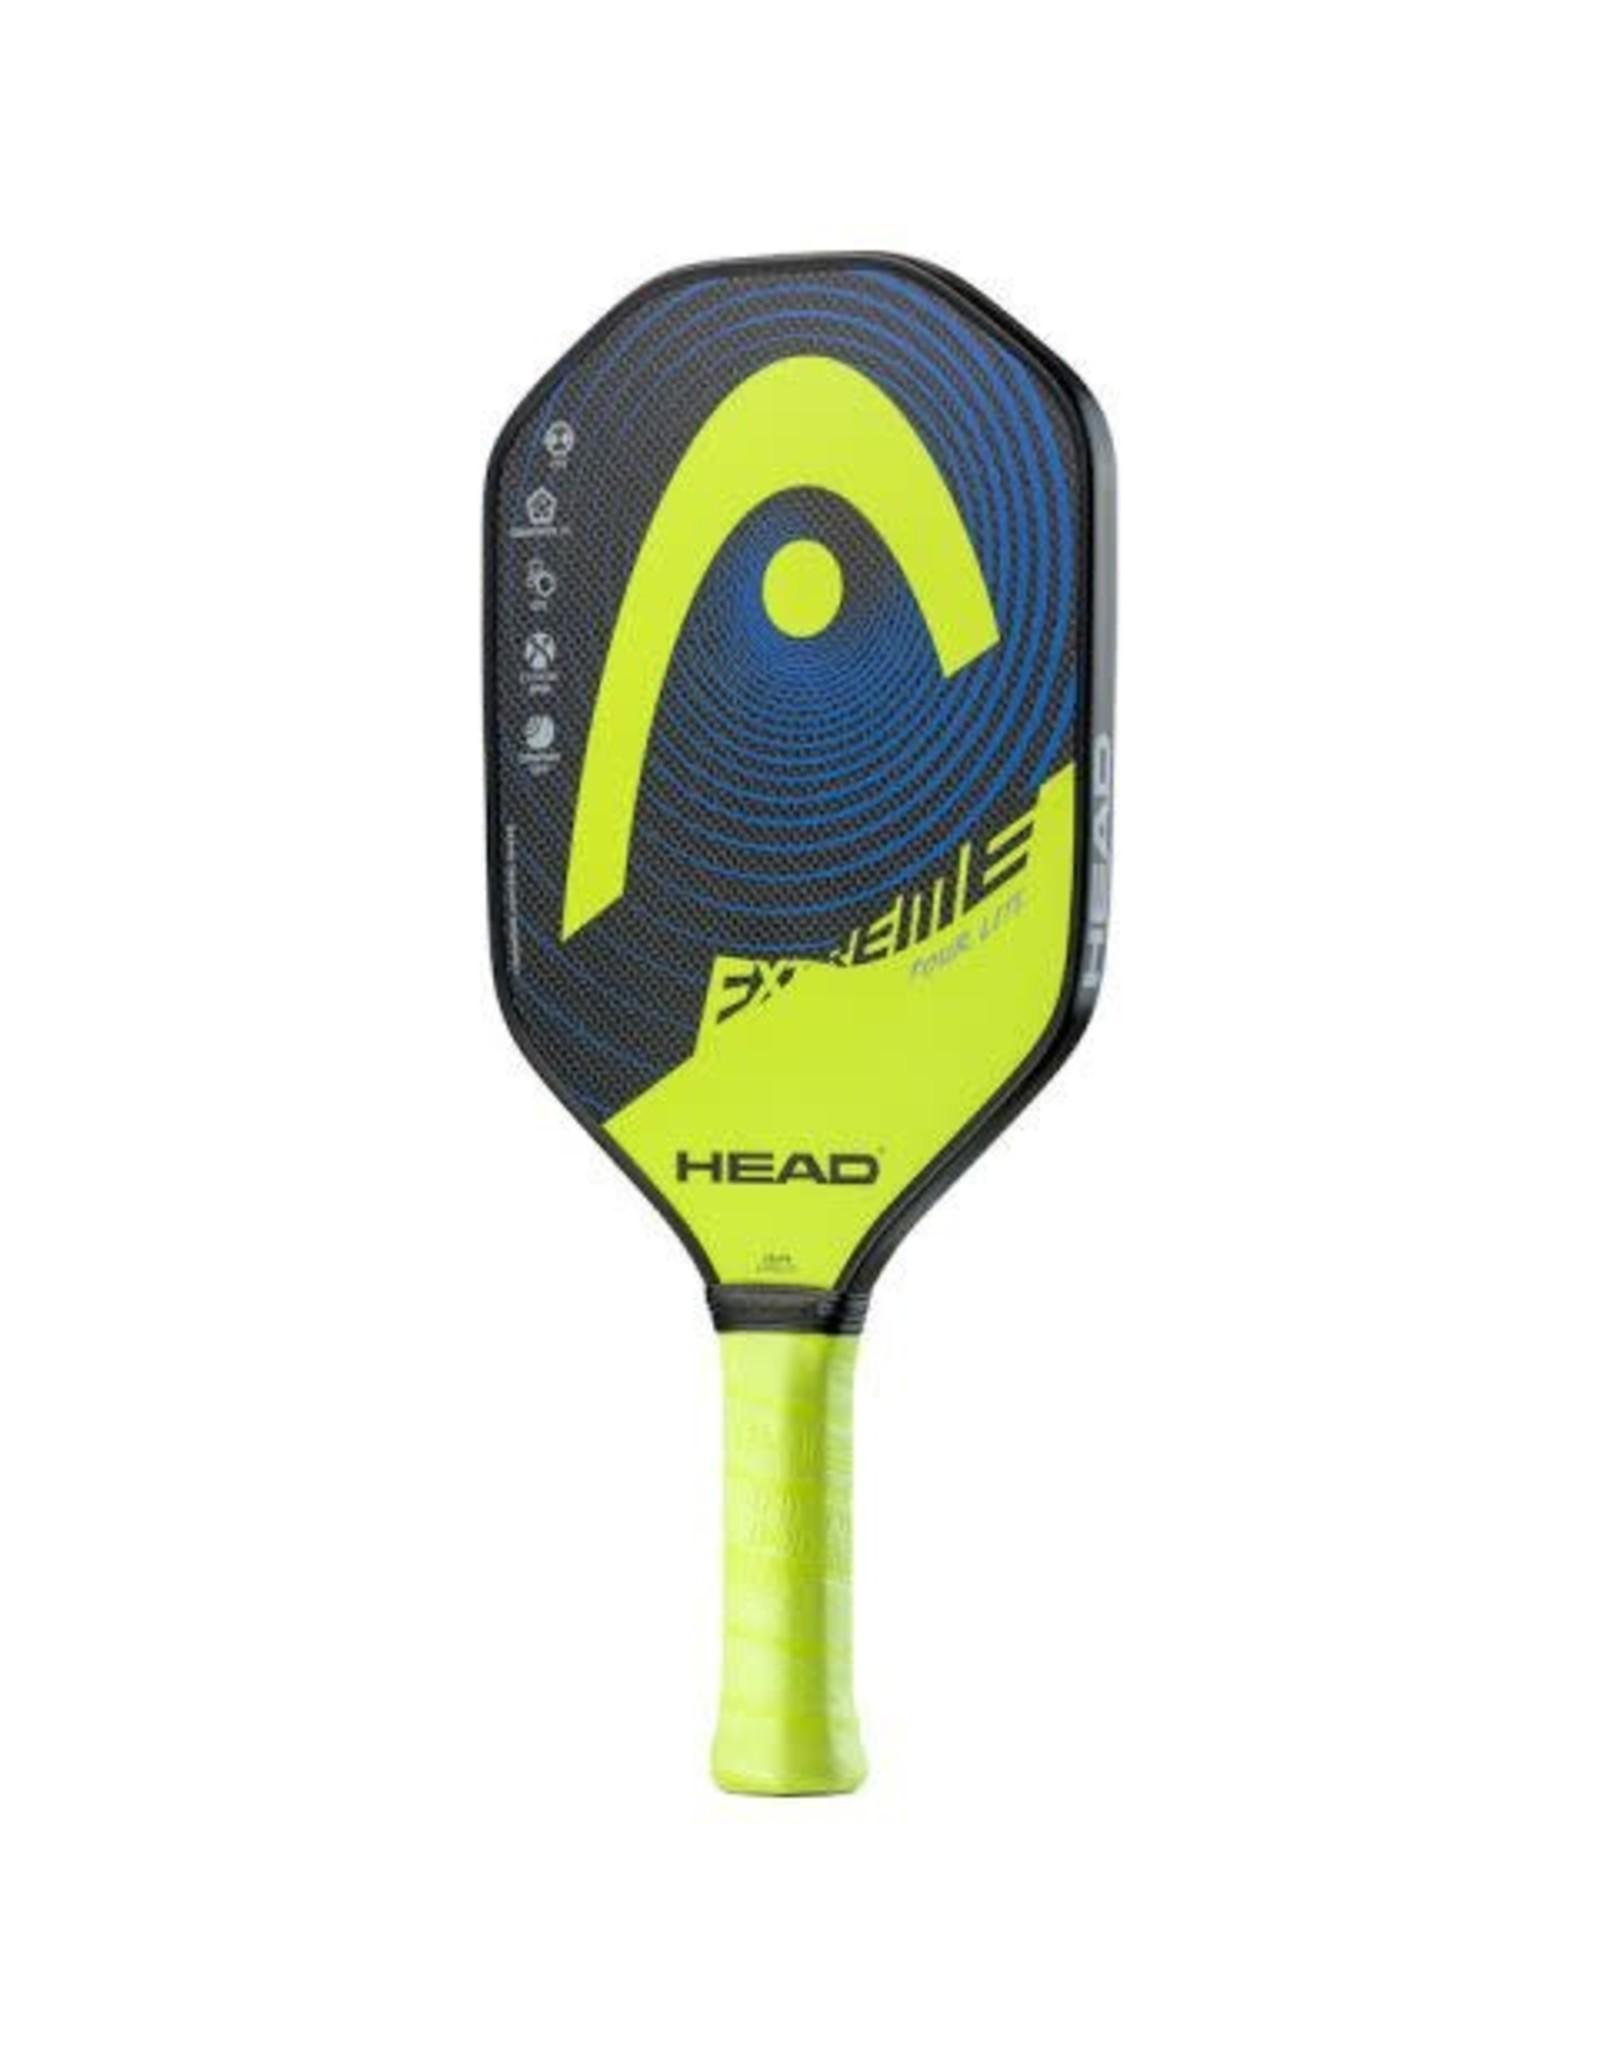 Head Head Extreme Tour Lite Yellow (2021) Pickleball Paddle